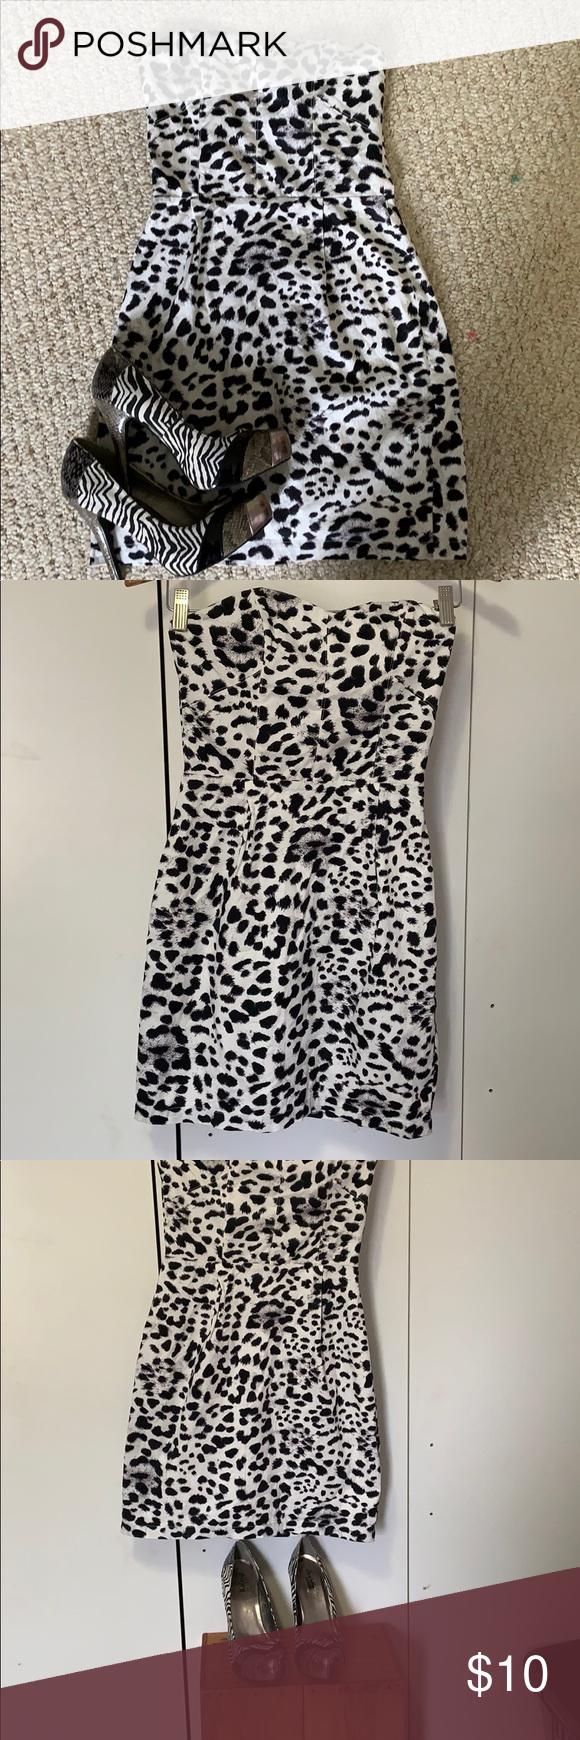 Leopard Print Dress By H M White Leopard Print Dress Made By H M Mini Dress Size 4 No Rips Or Stains Zipper Wor Leopard Print Dress Print Dress Leopard Print [ 1740 x 580 Pixel ]